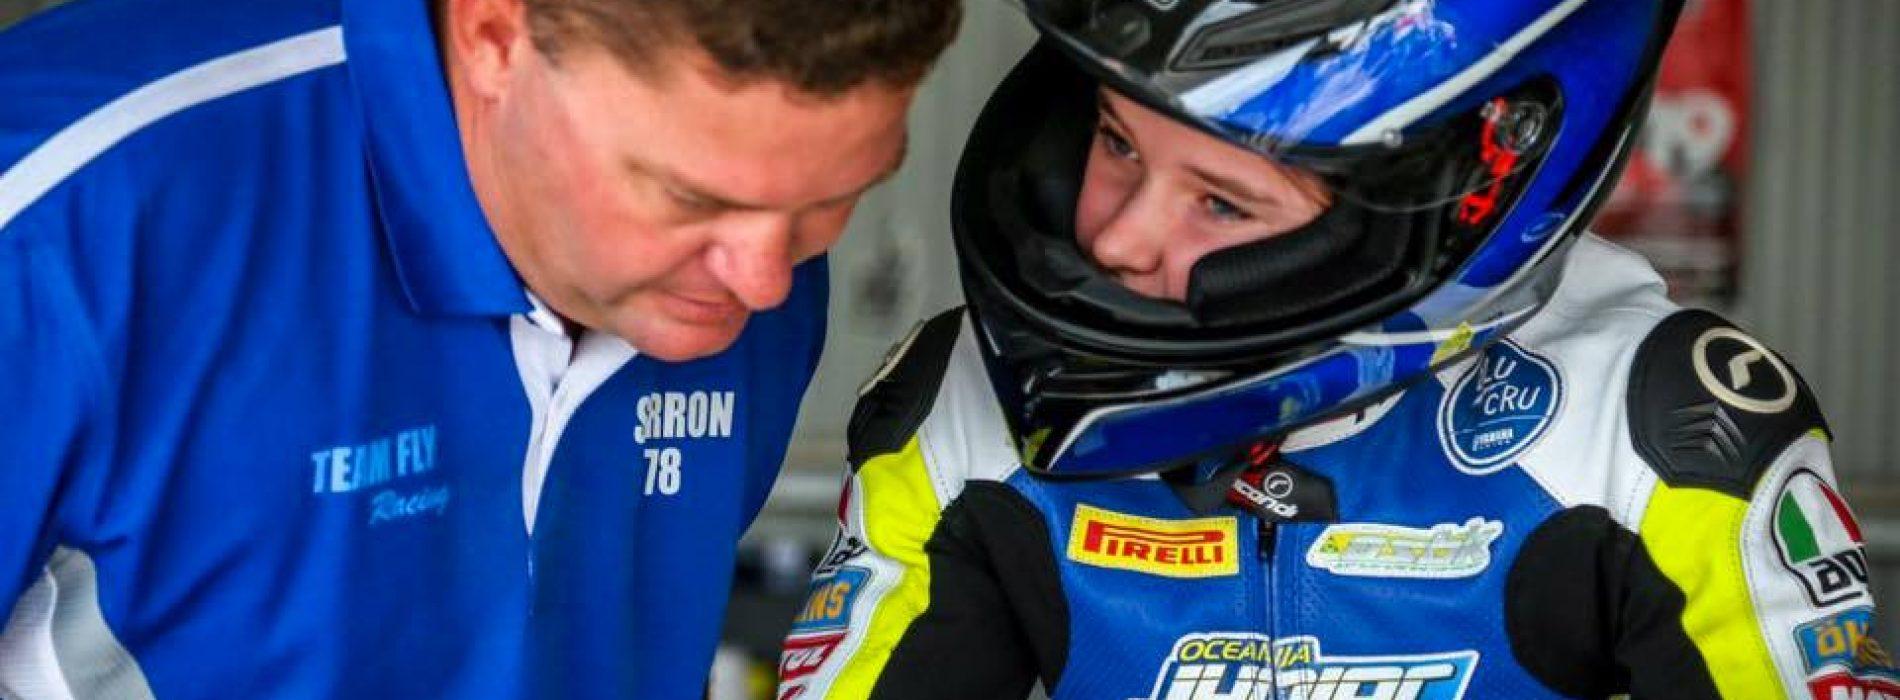 Pyper Kent Australia's up-coming Road Racing talent: how old?